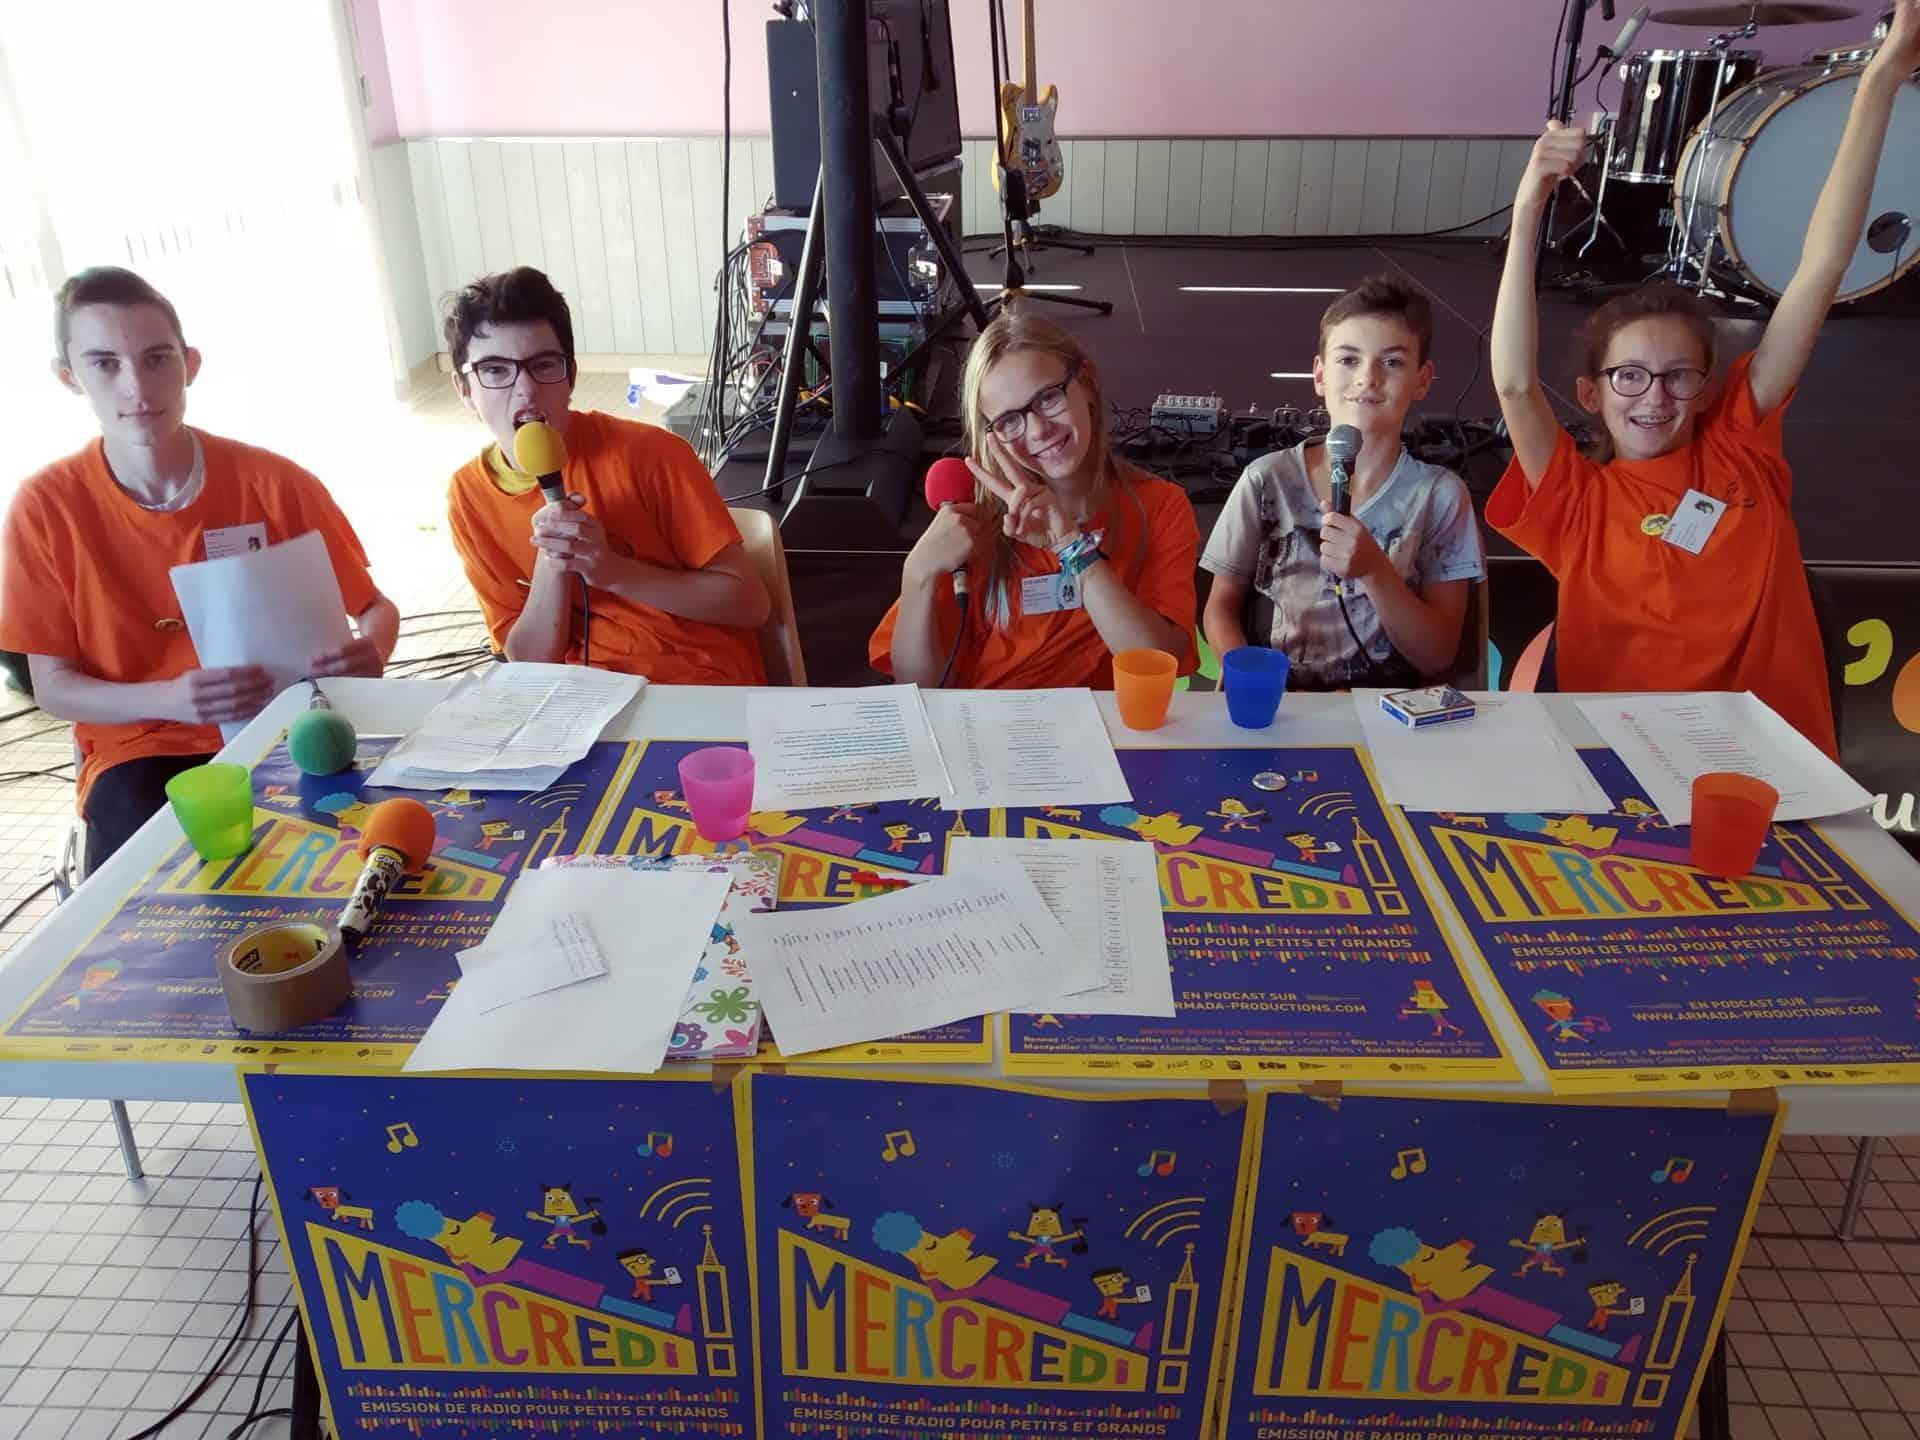 5 jeunes enregistrent une émission Mercredi